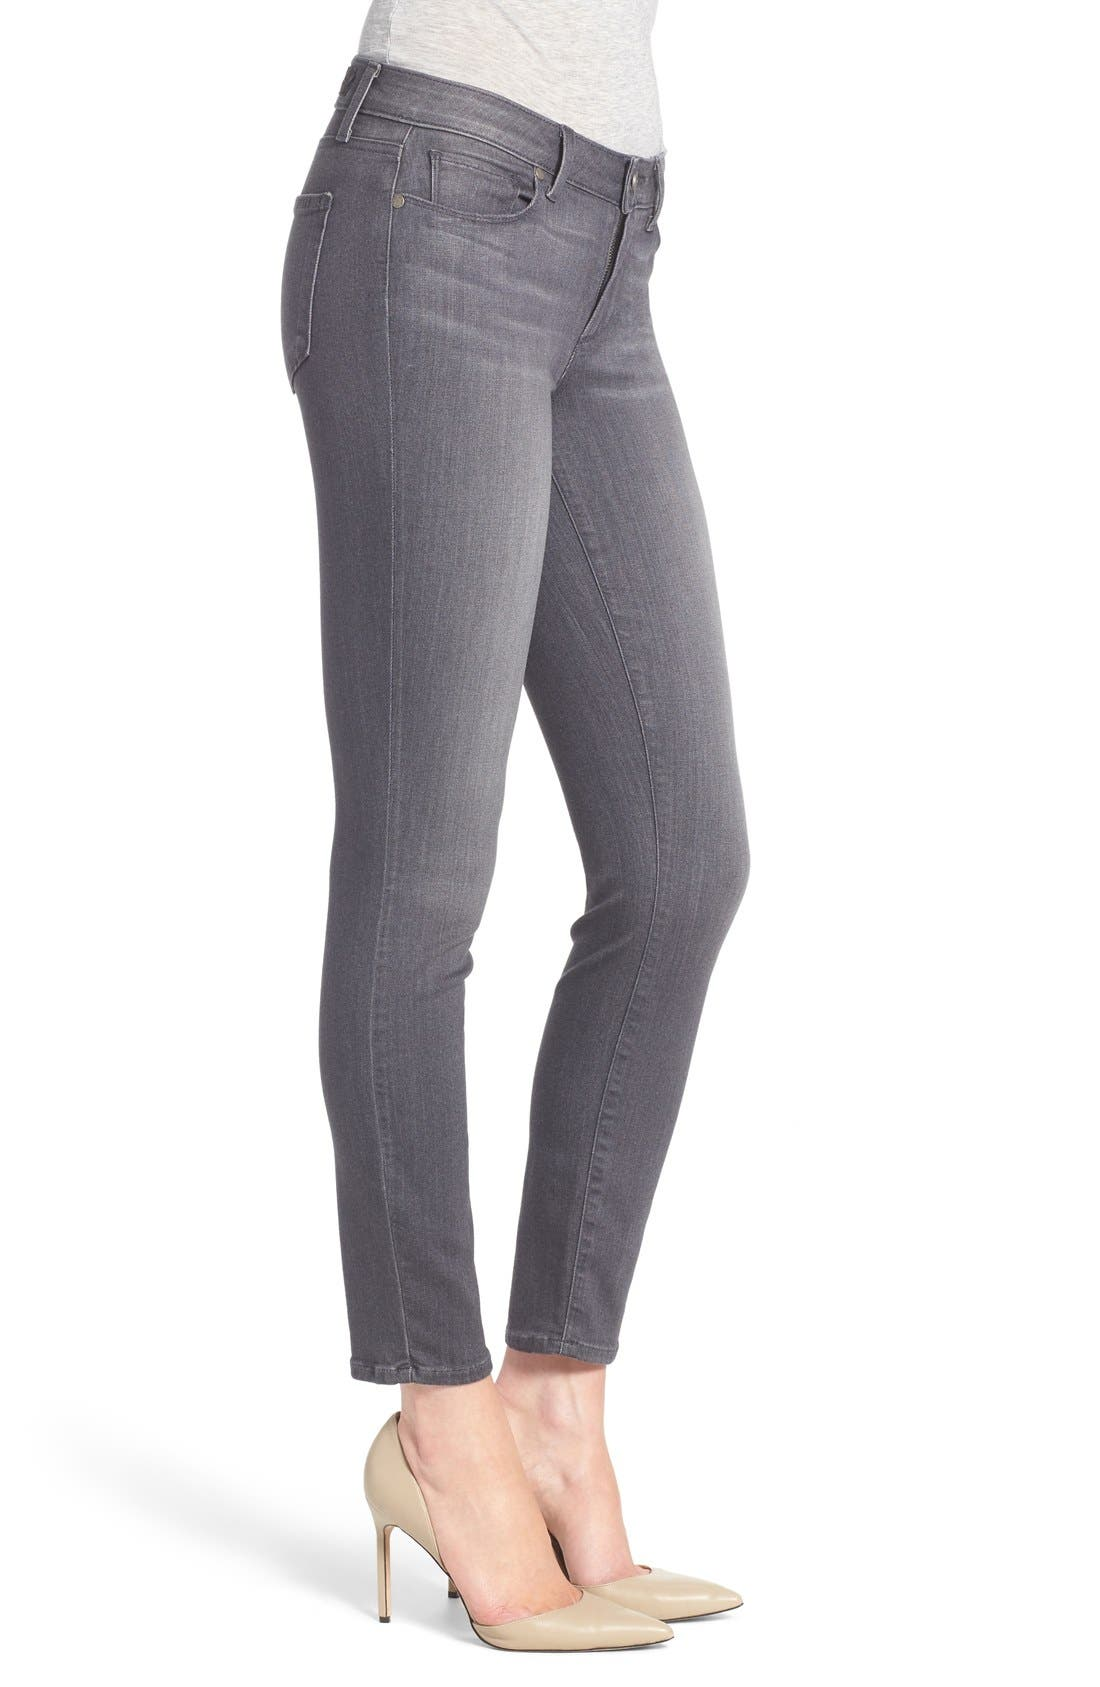 Alternate Image 3  - PAIGE Transcend - Verdugo Ankle Jeans (Bonnie Grey) (Nordstrom Exclusive)